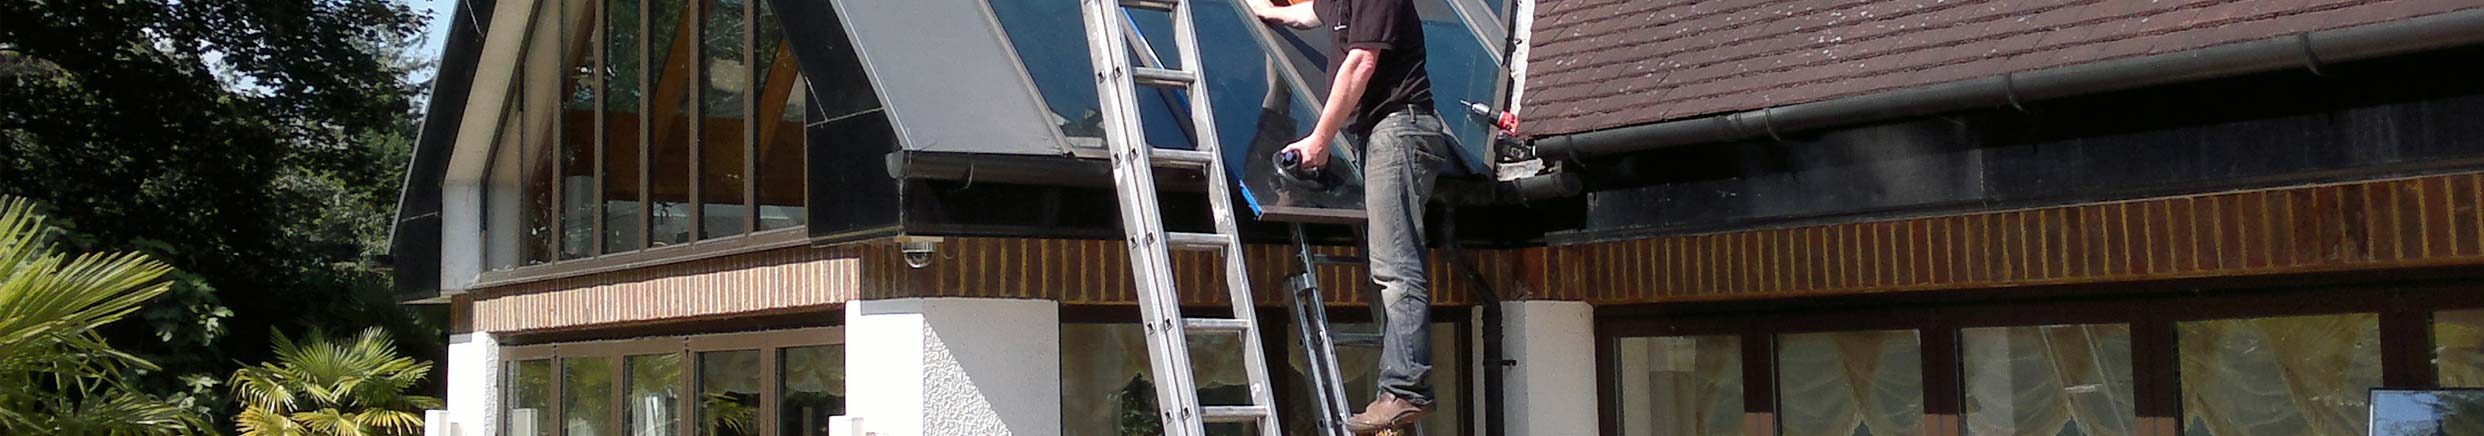 Roof glazing and skylights reglazed